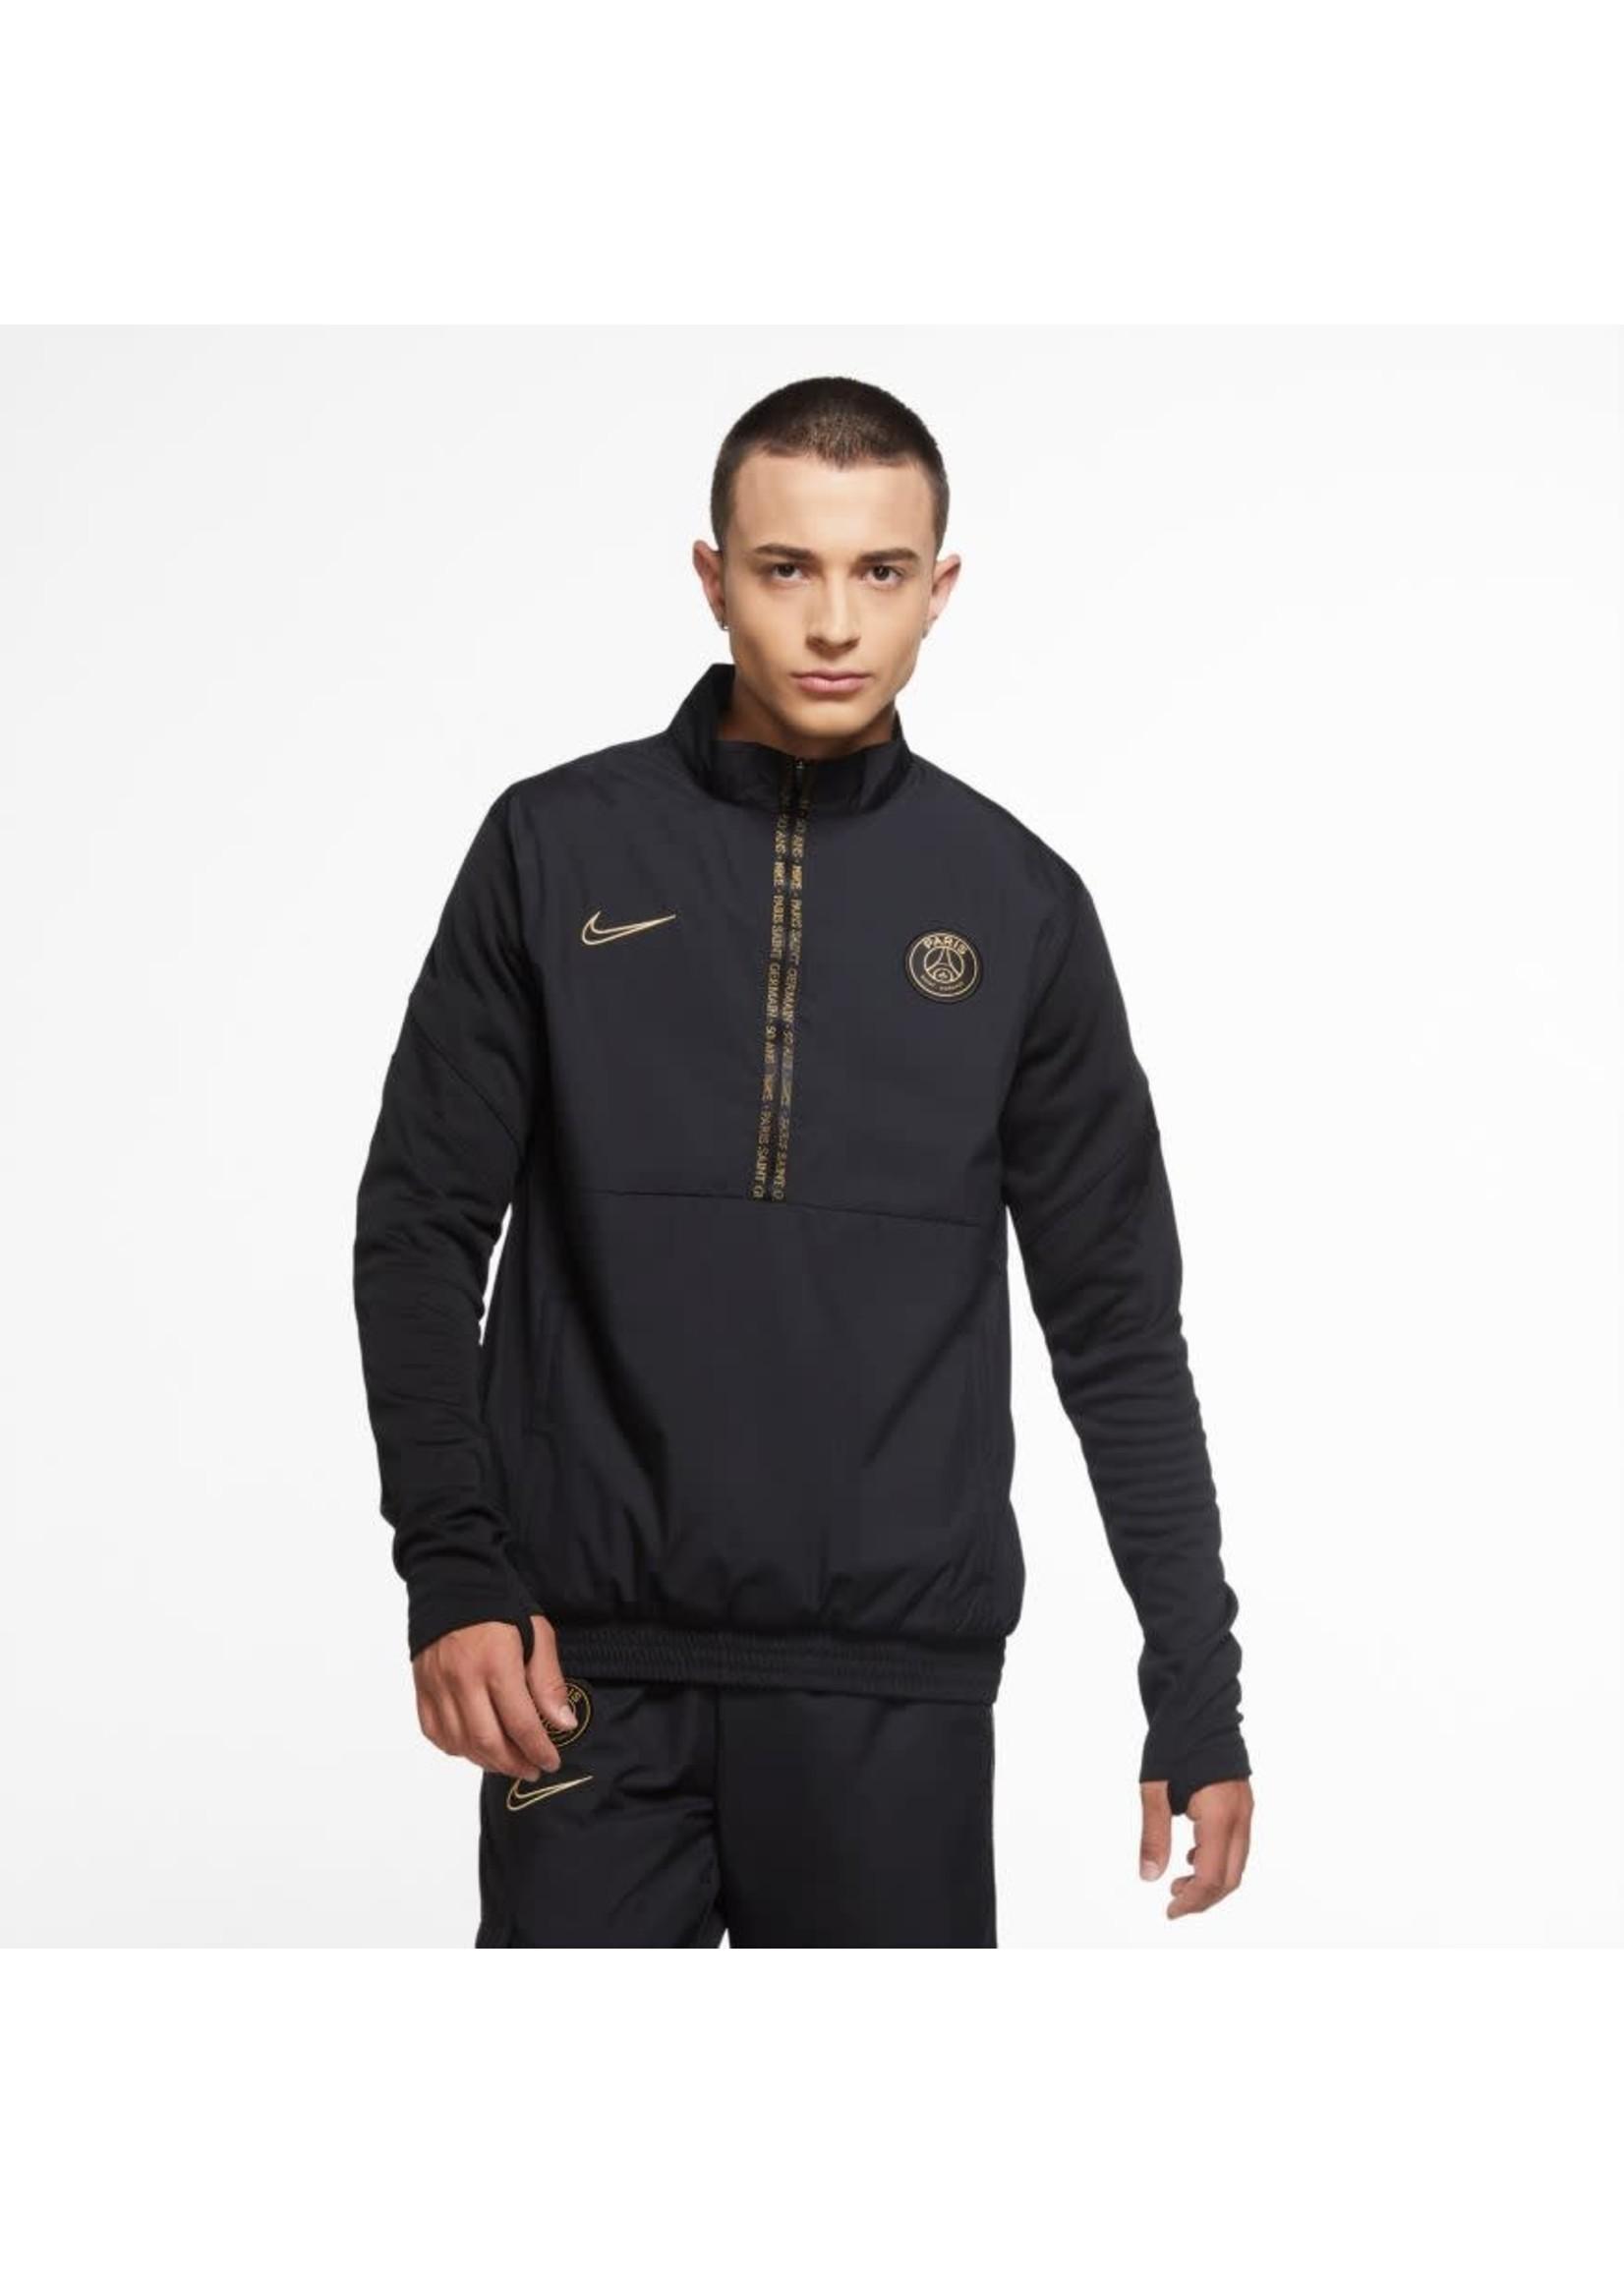 Nike Paris Saint-Germain 1/4 Zip Jacket